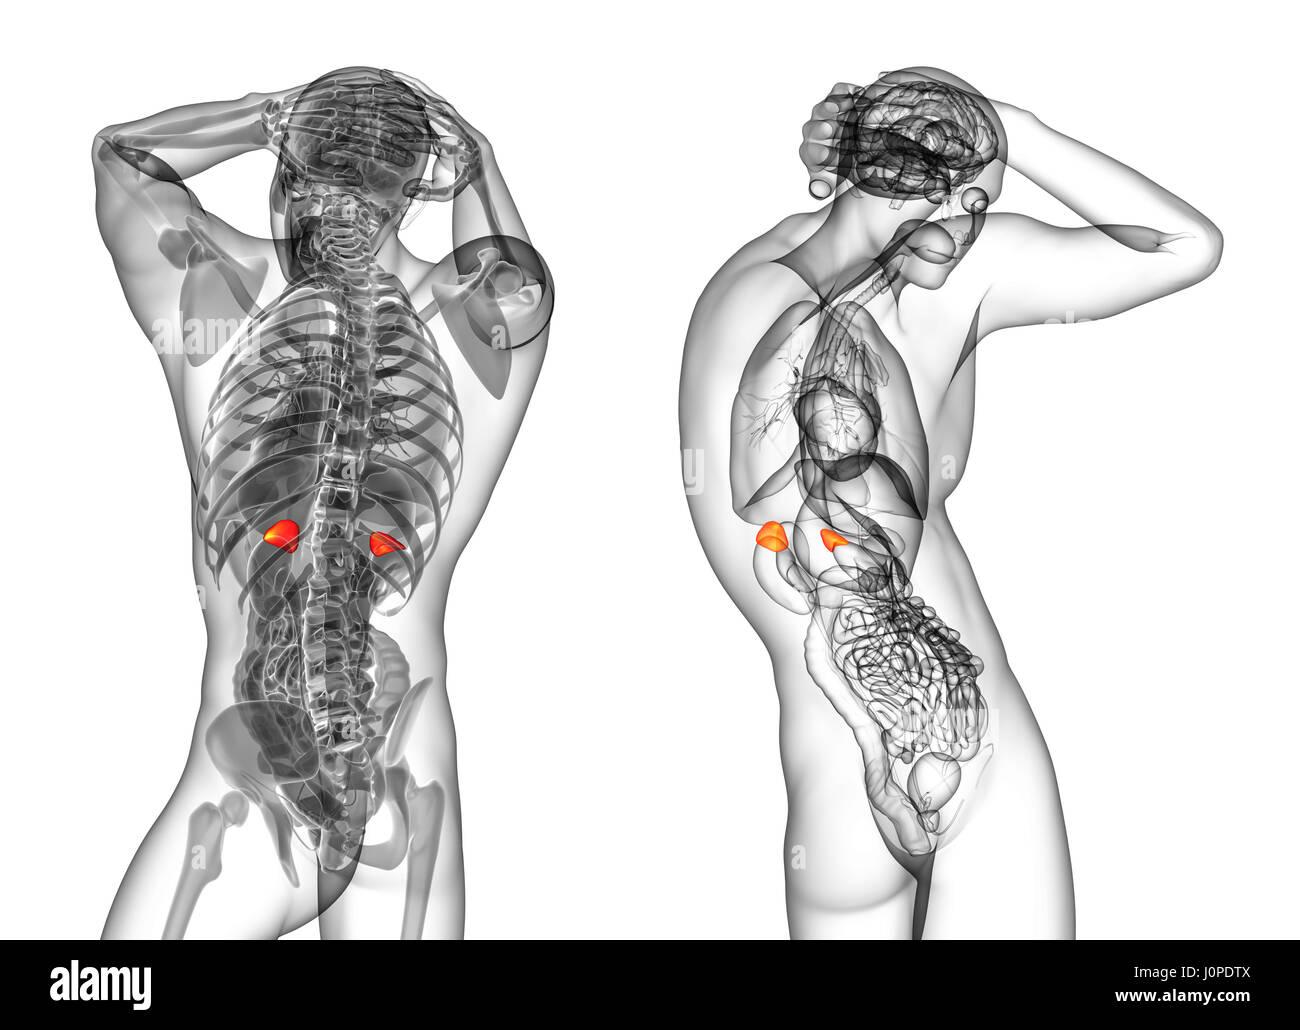 3d Rendering Medical Illustration Of The Human Adrenal Glands Stock